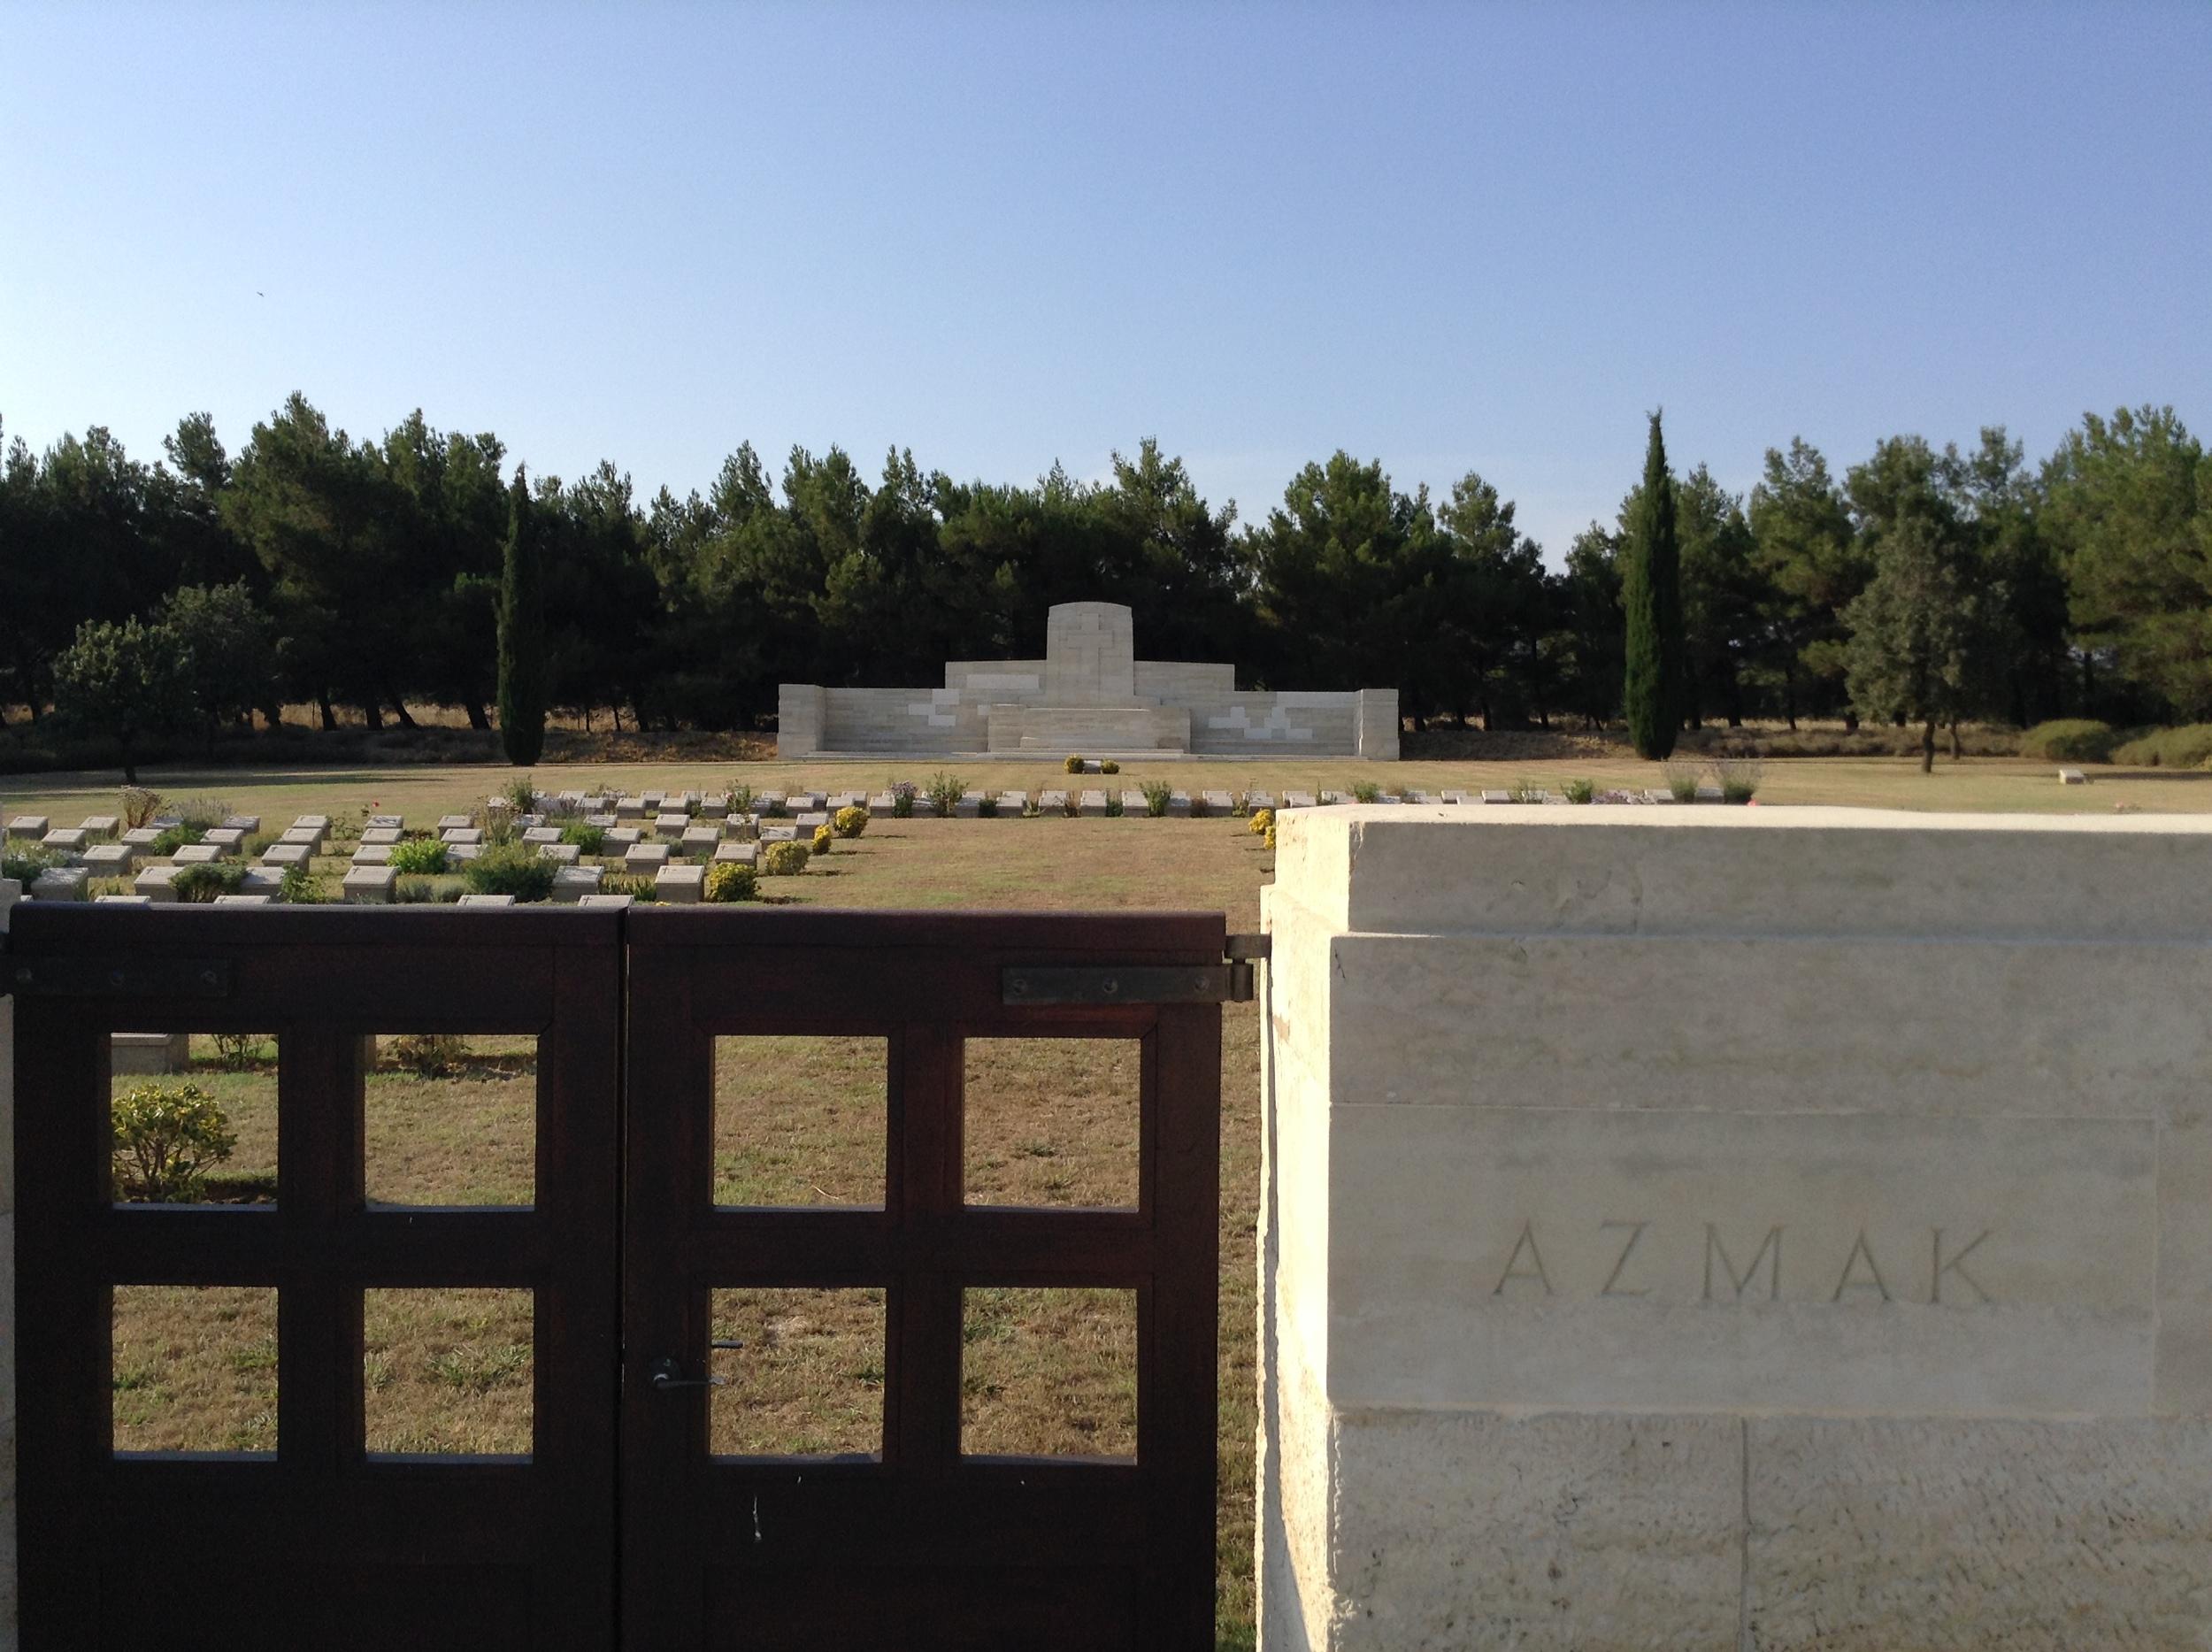 AMZAK cemetery